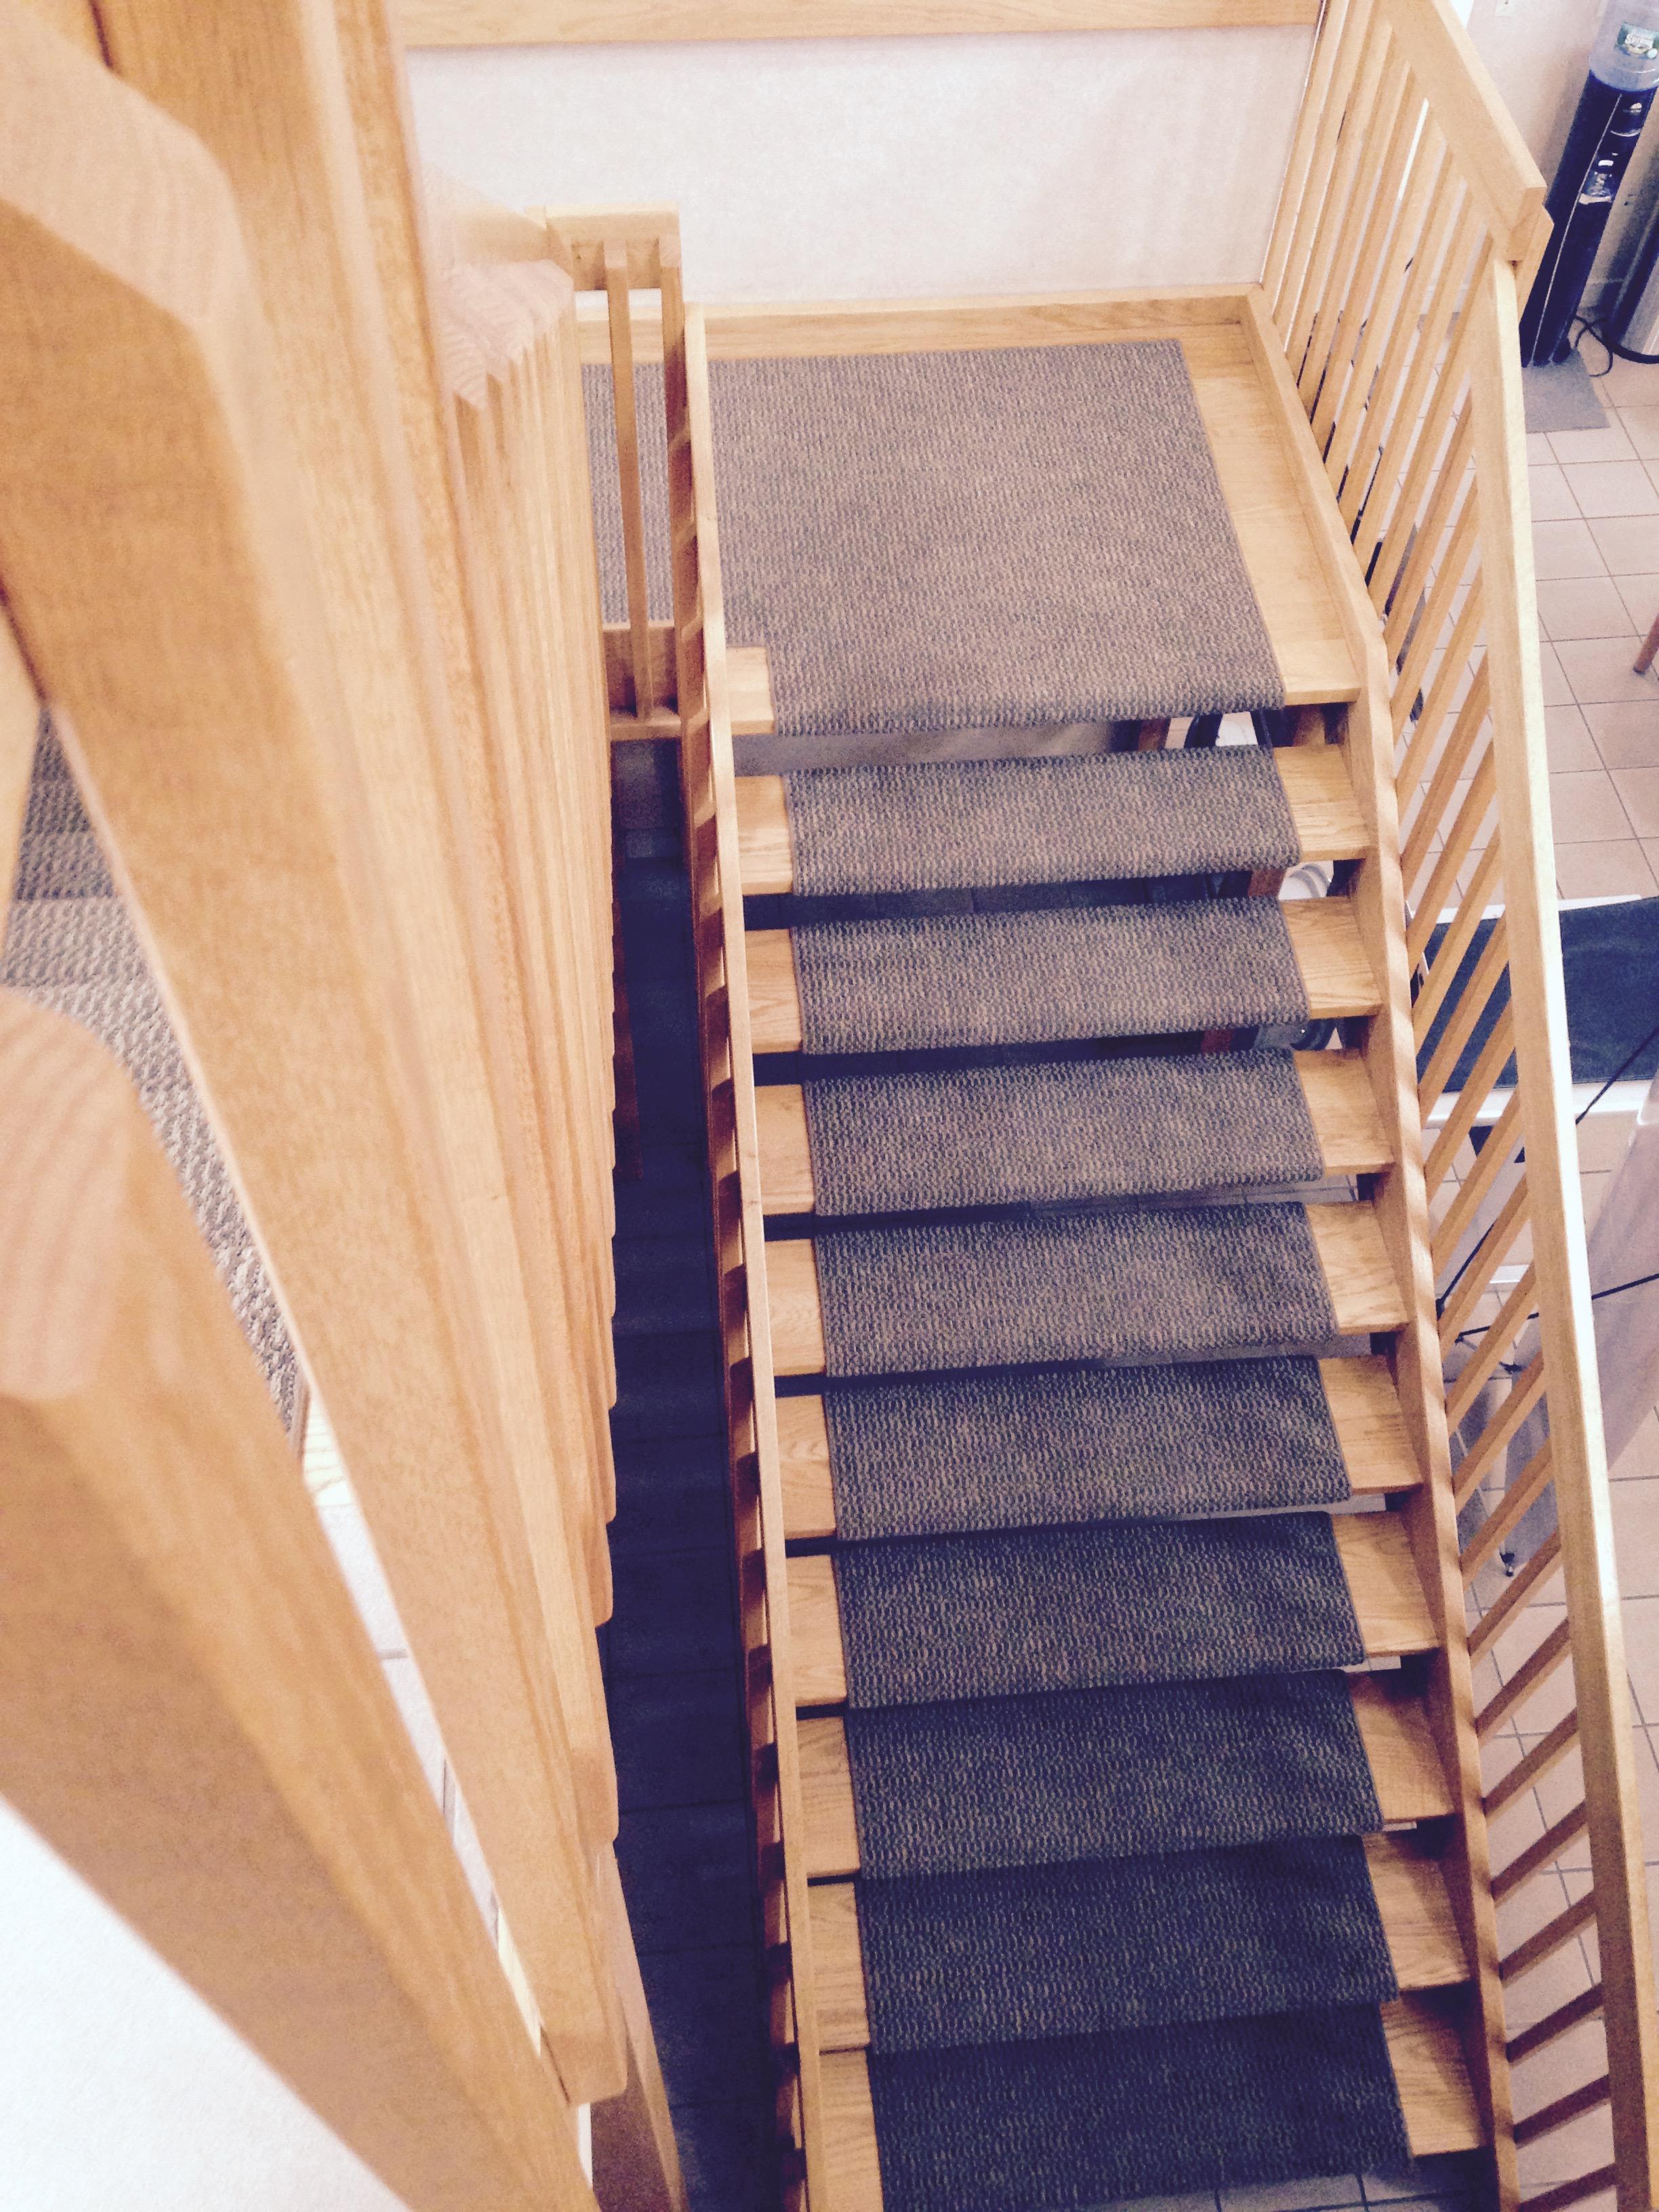 ms tupelo floor carpet in installation hardwood and adair flooring